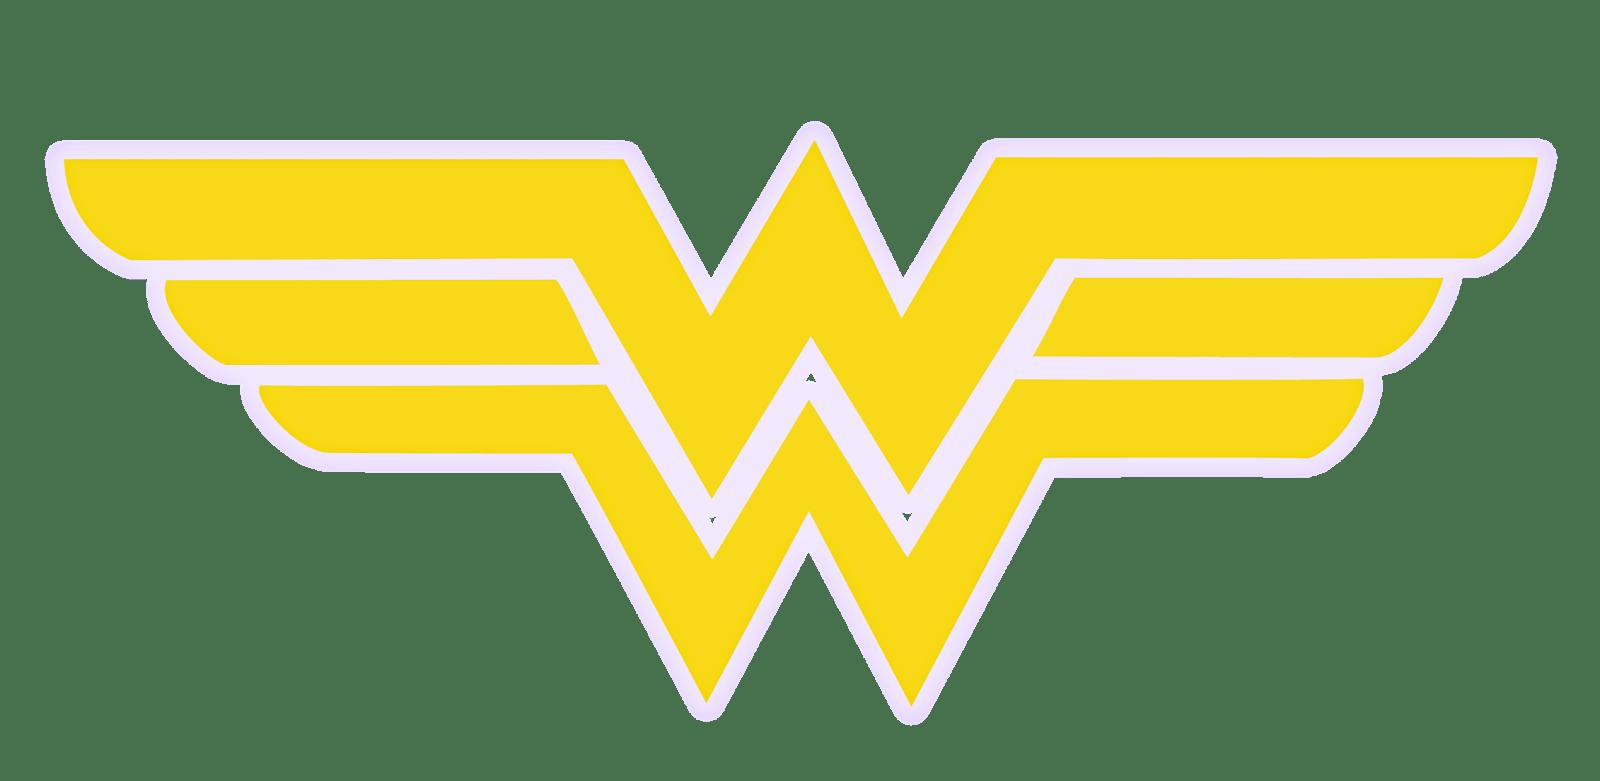 Wonderwoman Baby Clipart. Lembrancinhas mulher maravilha